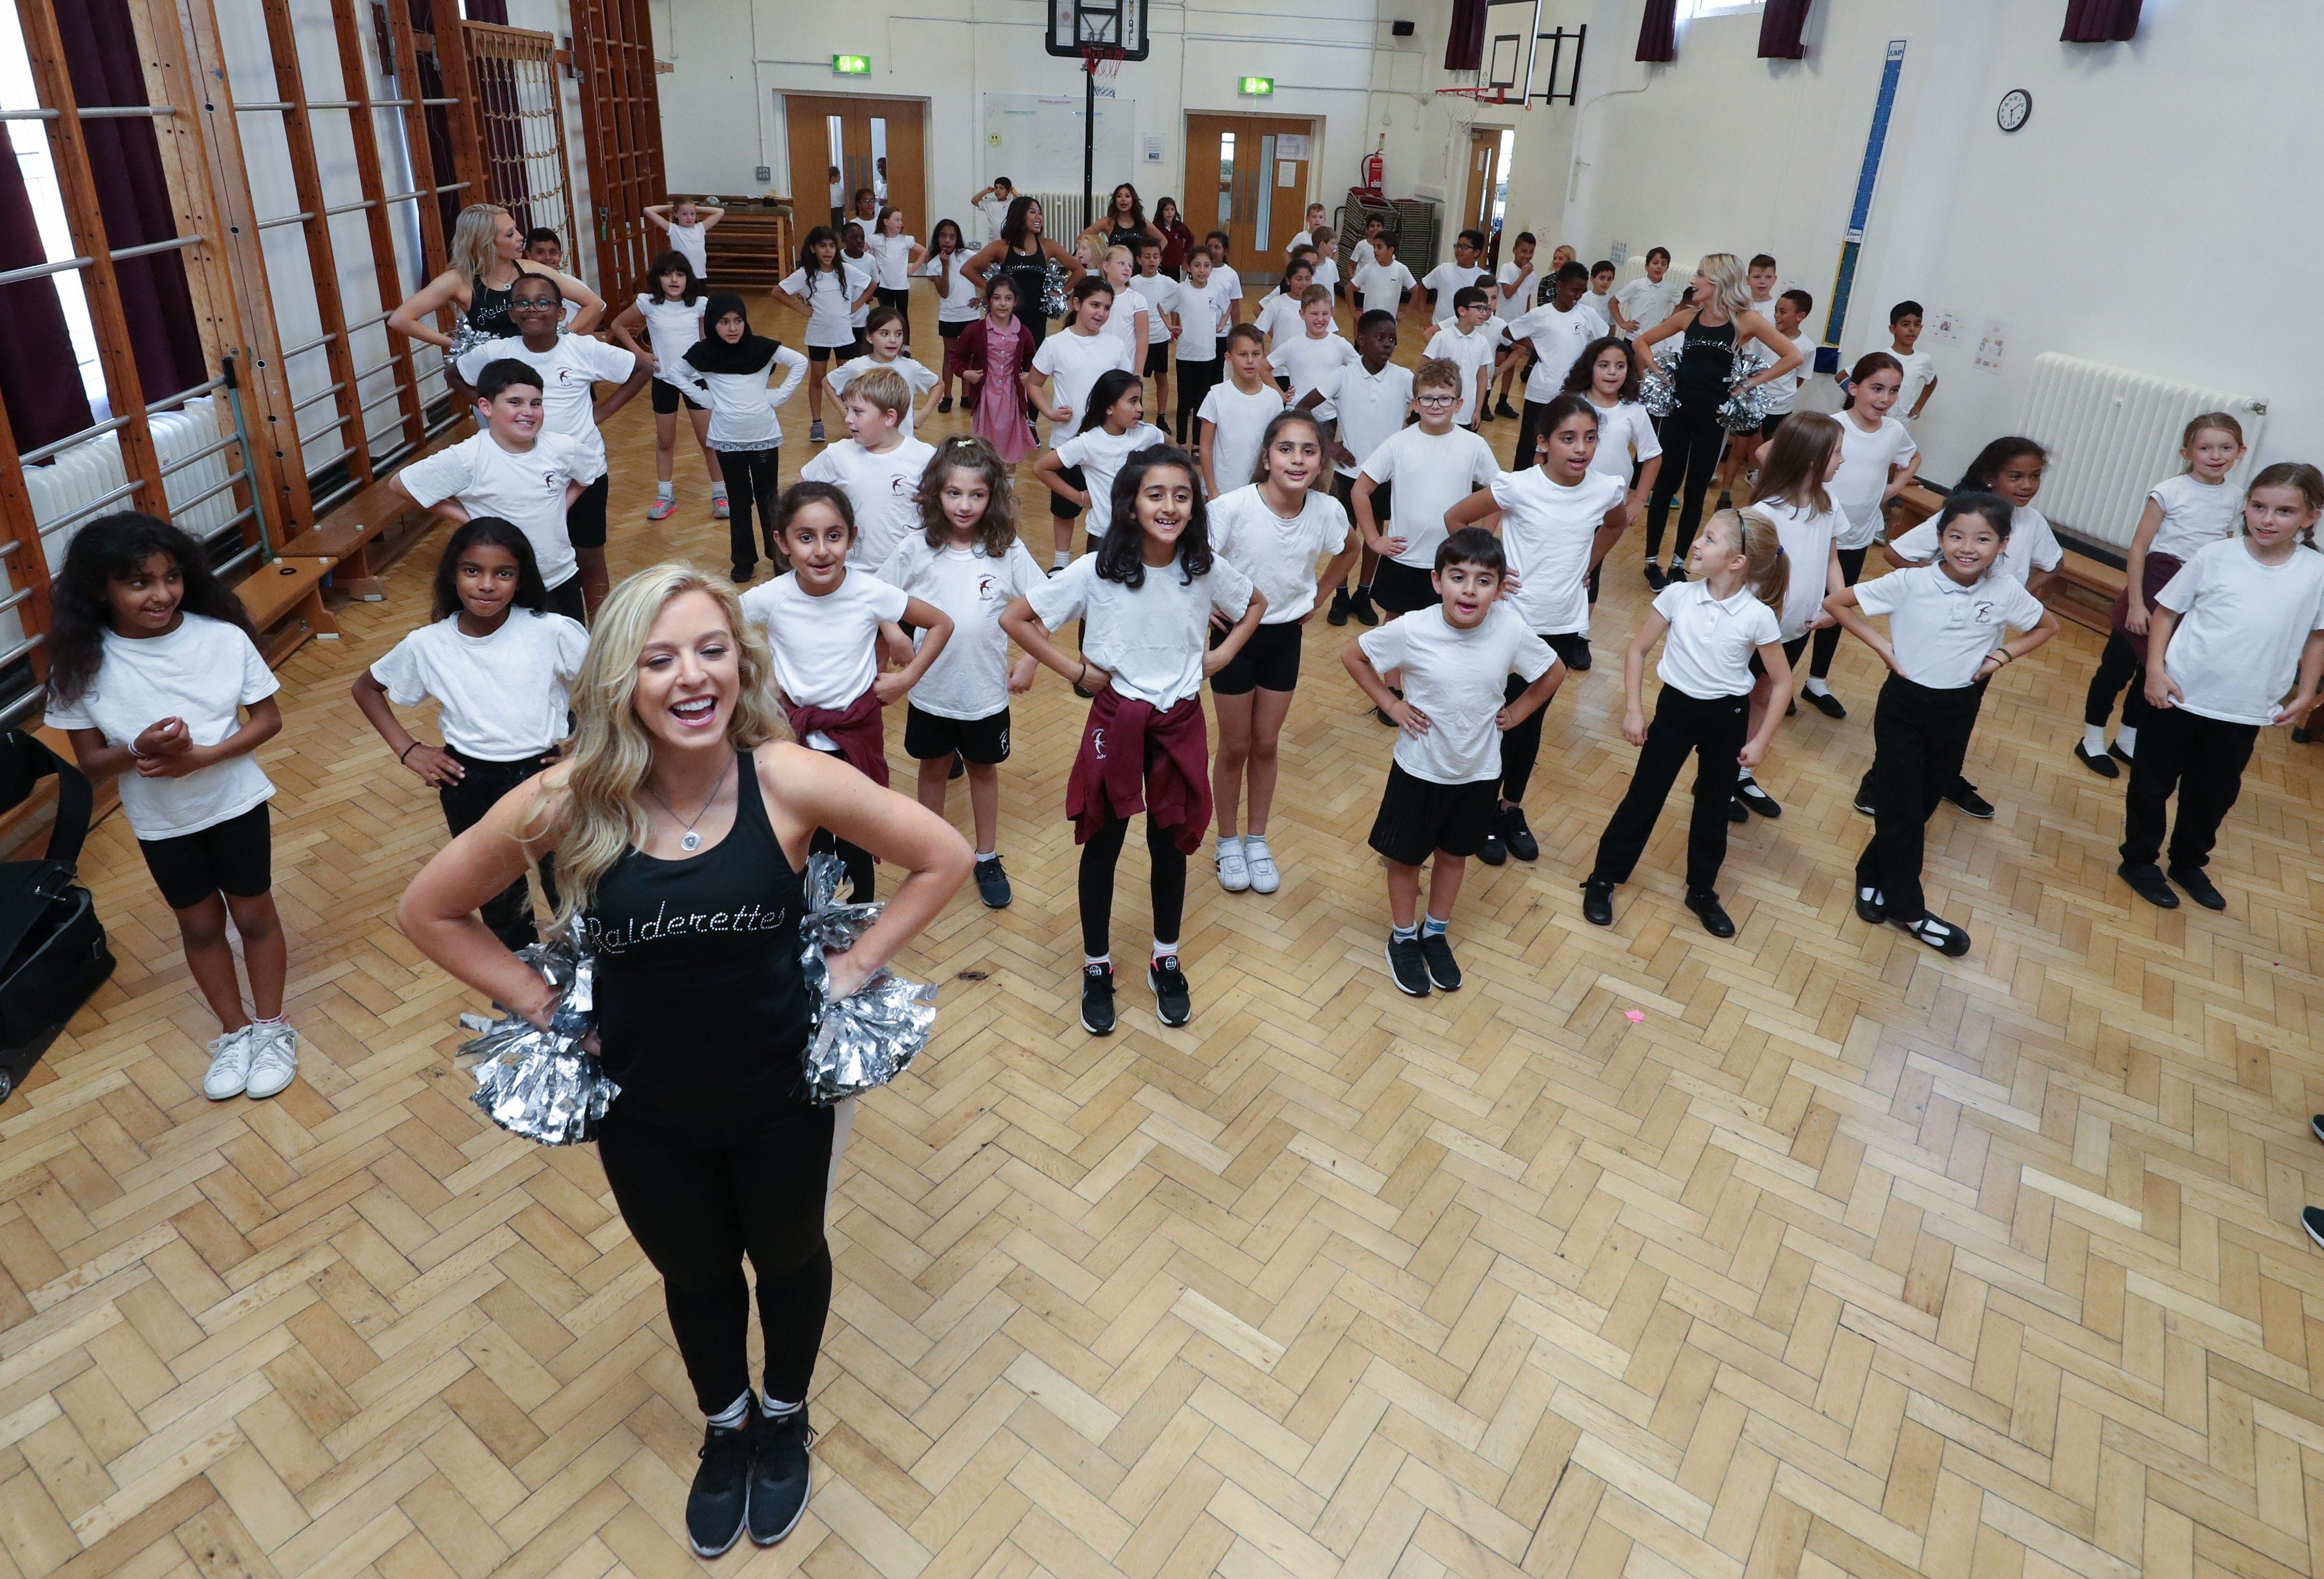 The Oakland Raiders cheerleaders teach school children their moves